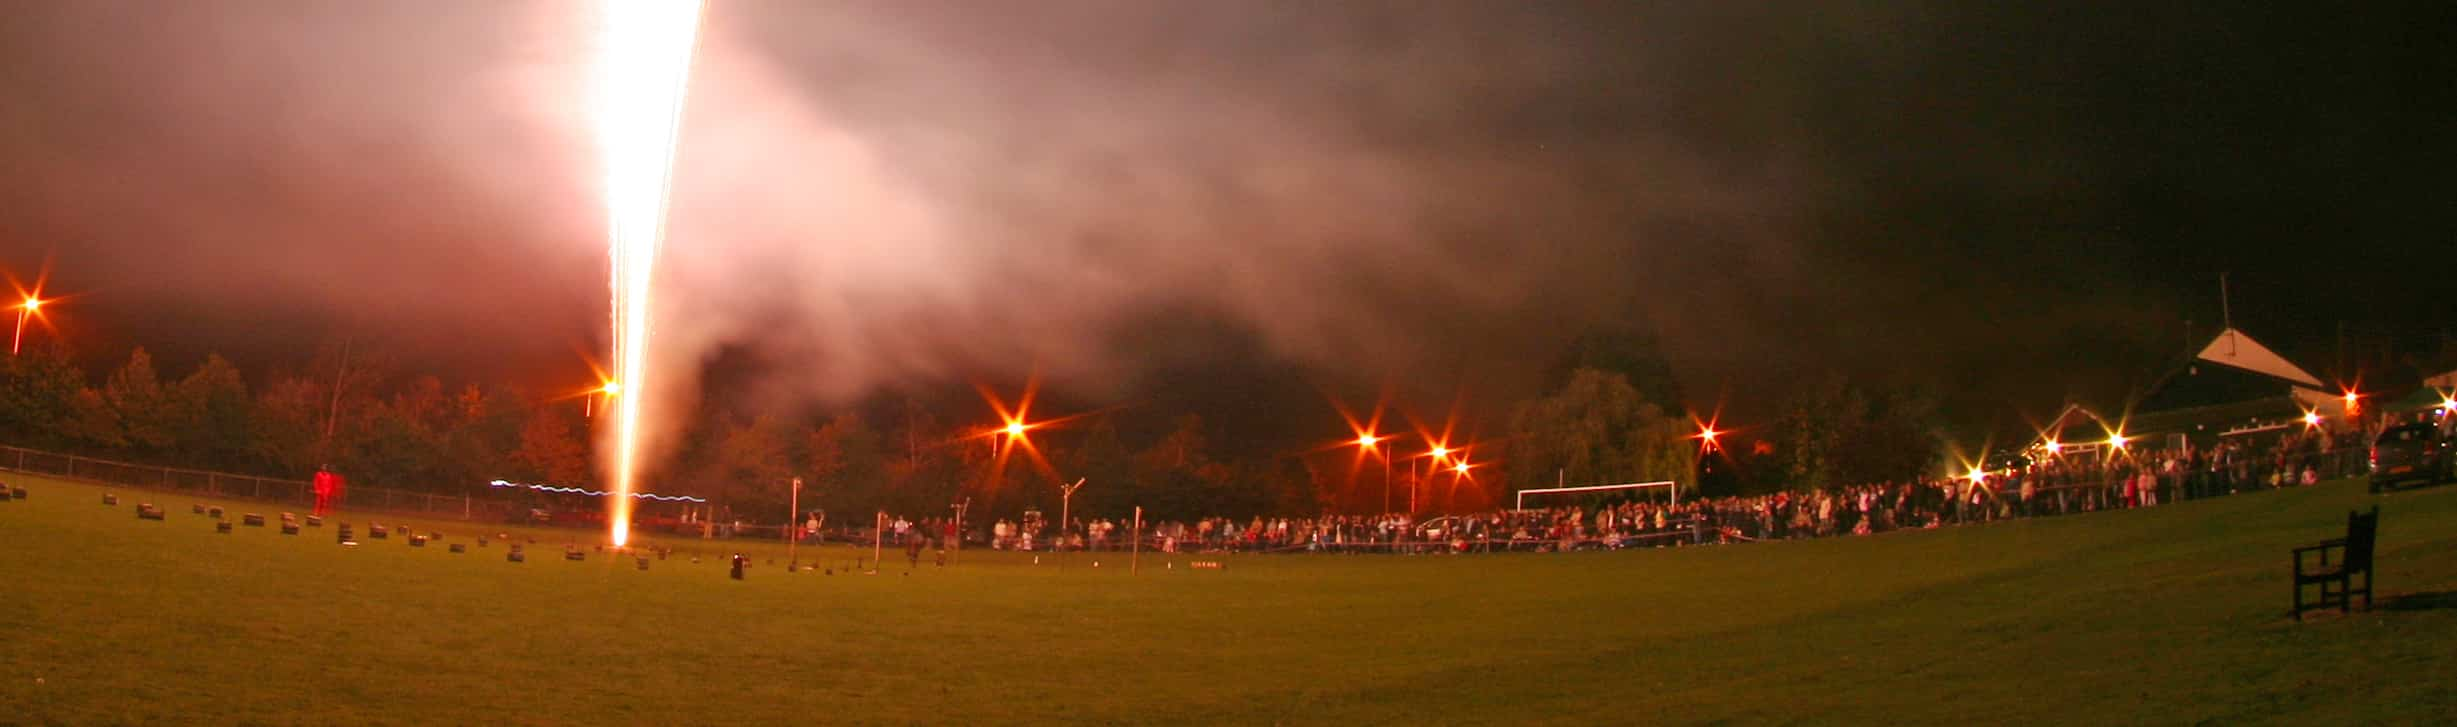 Demo Night Fireworks